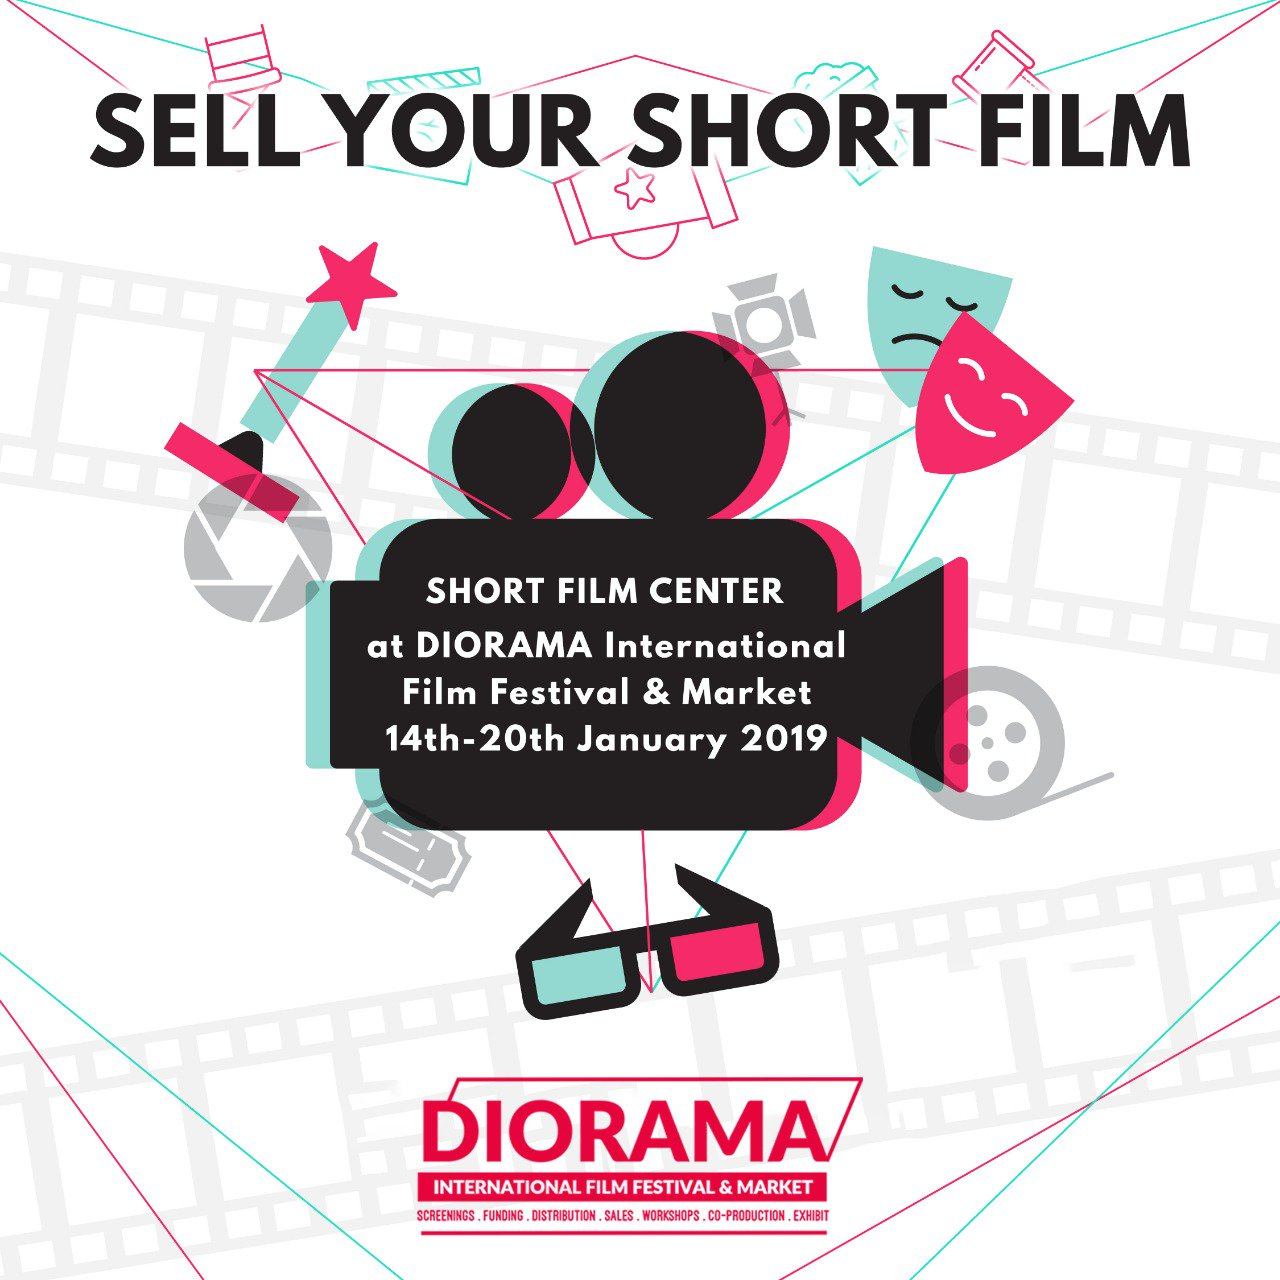 Diorama International Film Festival على تويتر: